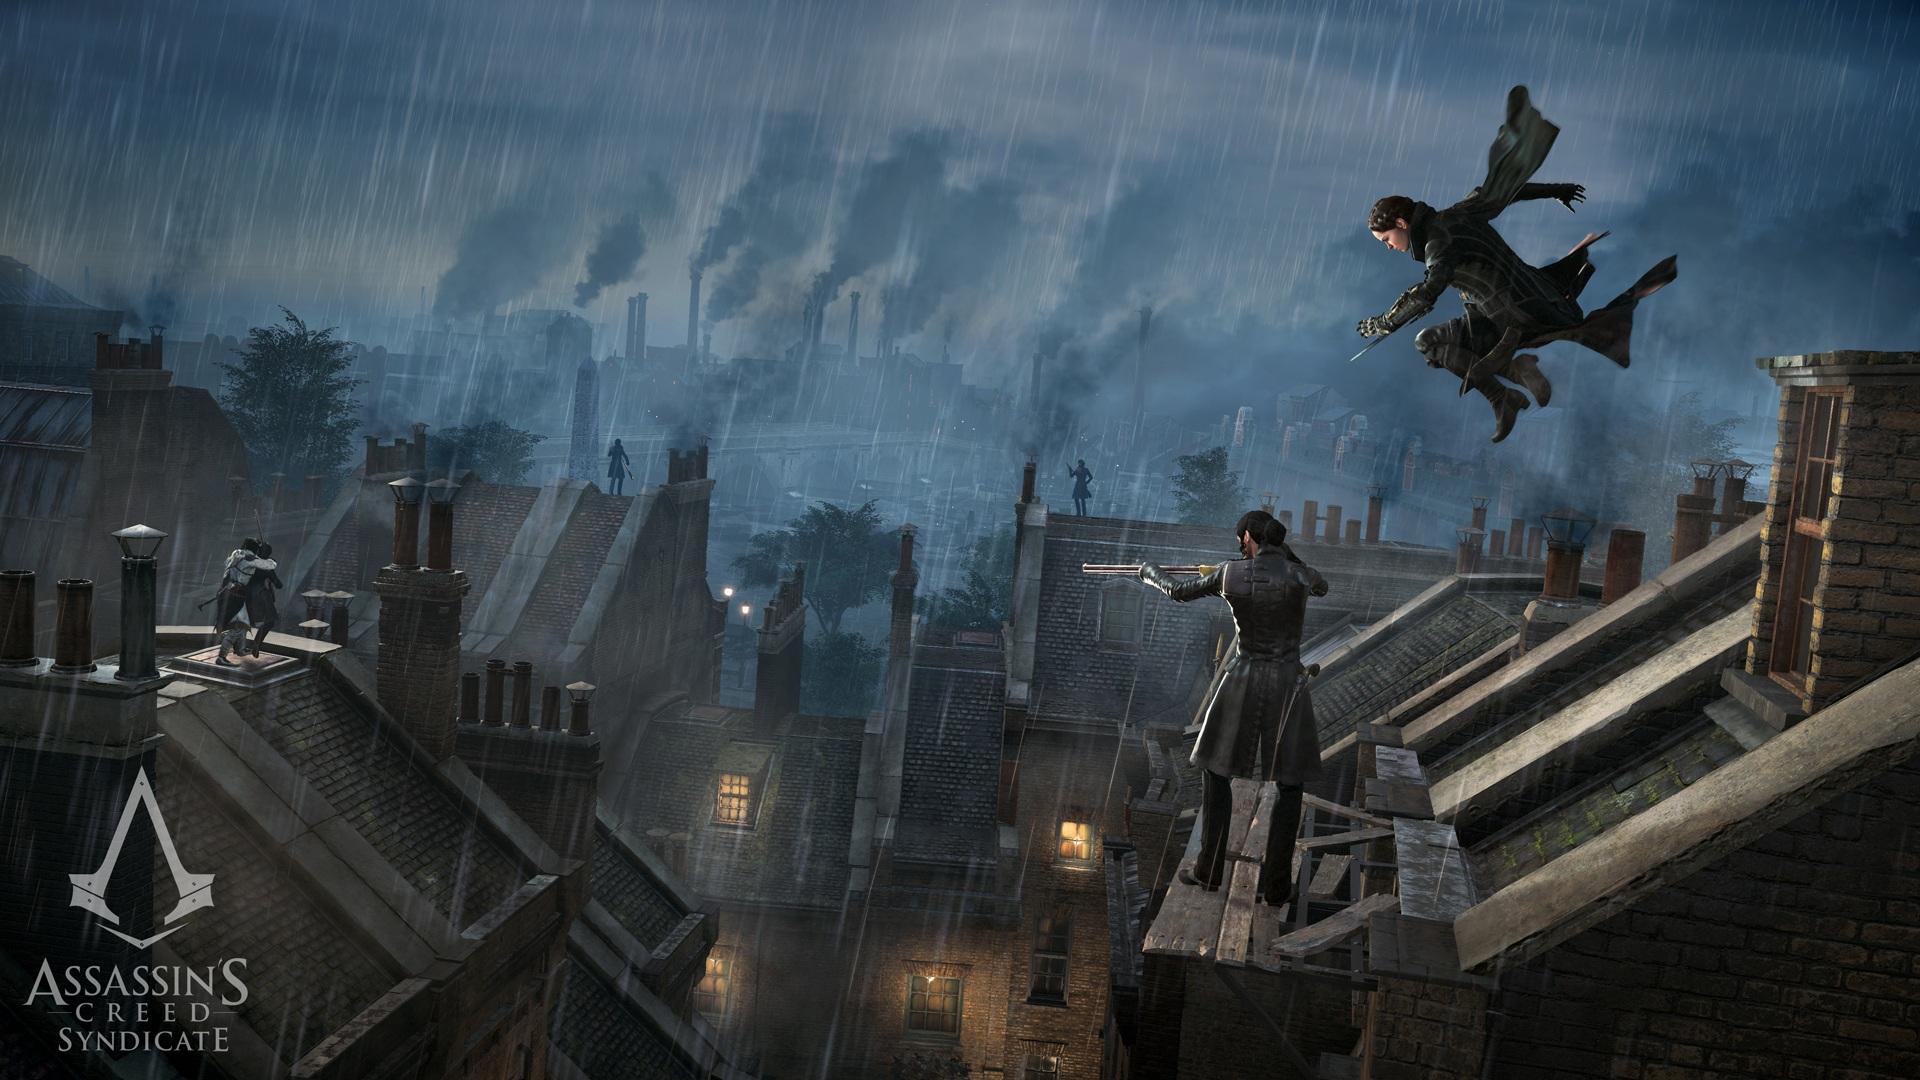 Beautiful Wallpaper Horse Assassin'S Creed - Assassins-Creed-Syndicate-4  Snapshot_238291.jpg